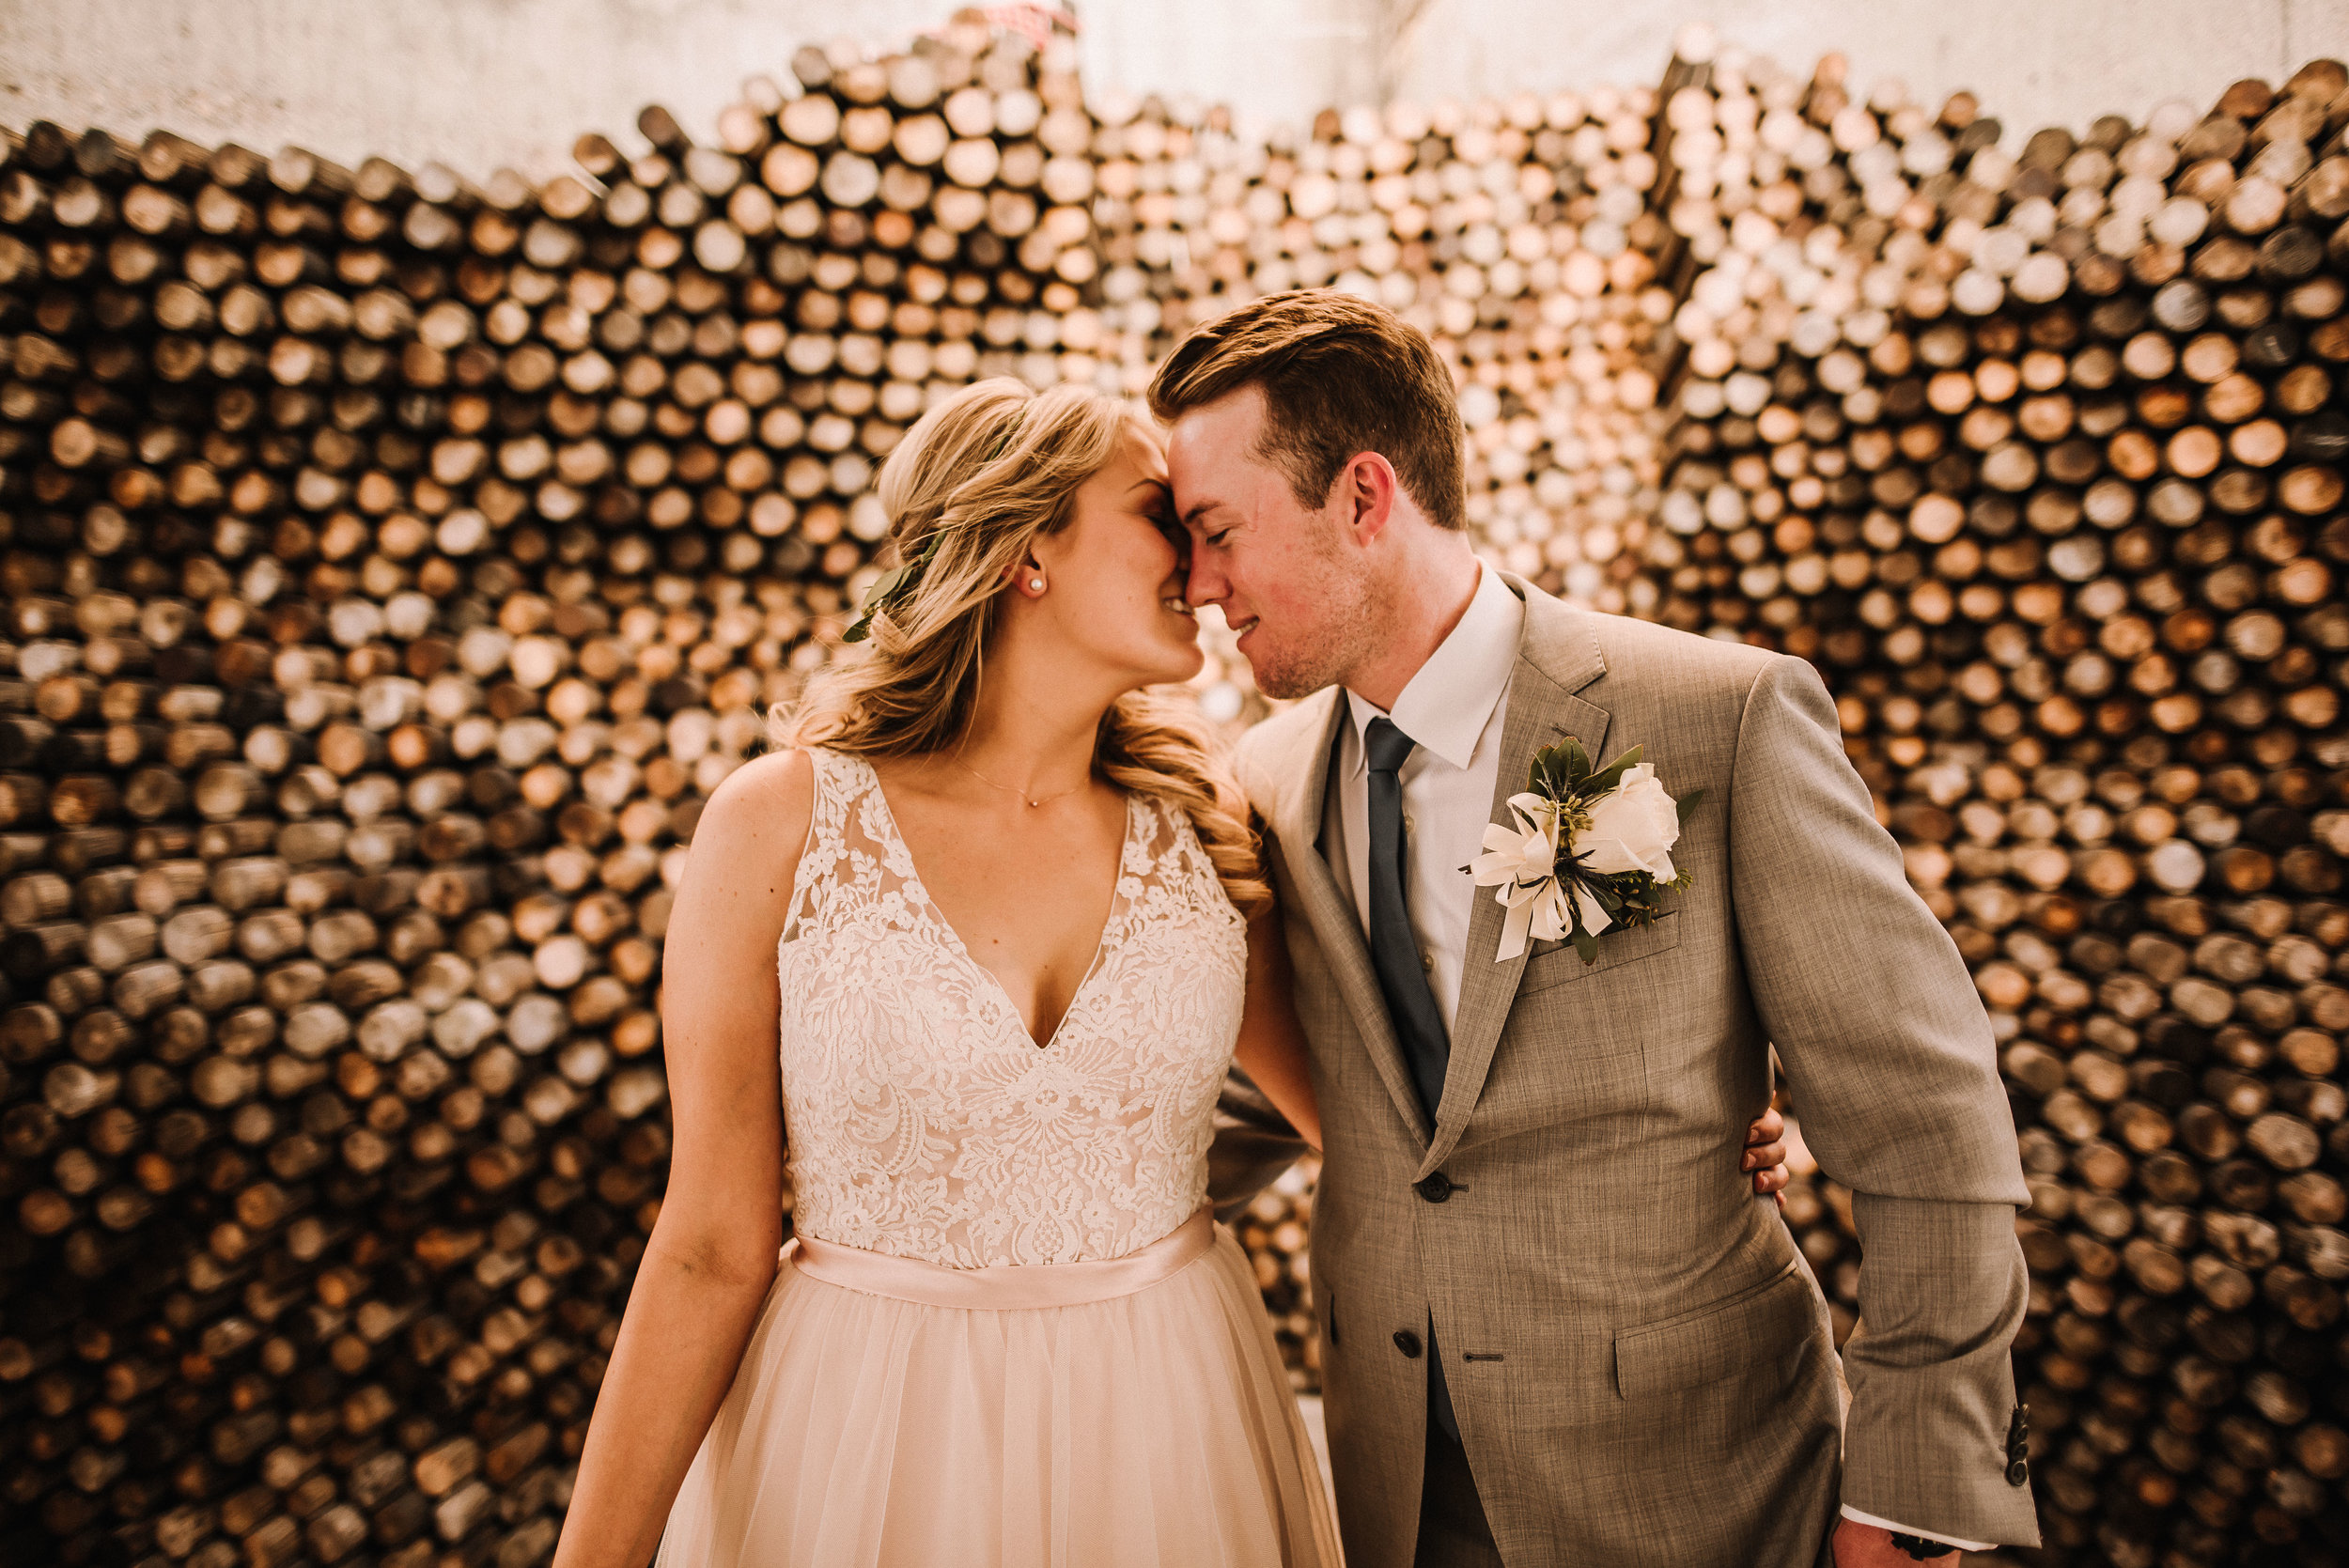 Pearson-Wiseacre-Wedding_Ashley-Benham-Photography (313 of 633).jpg